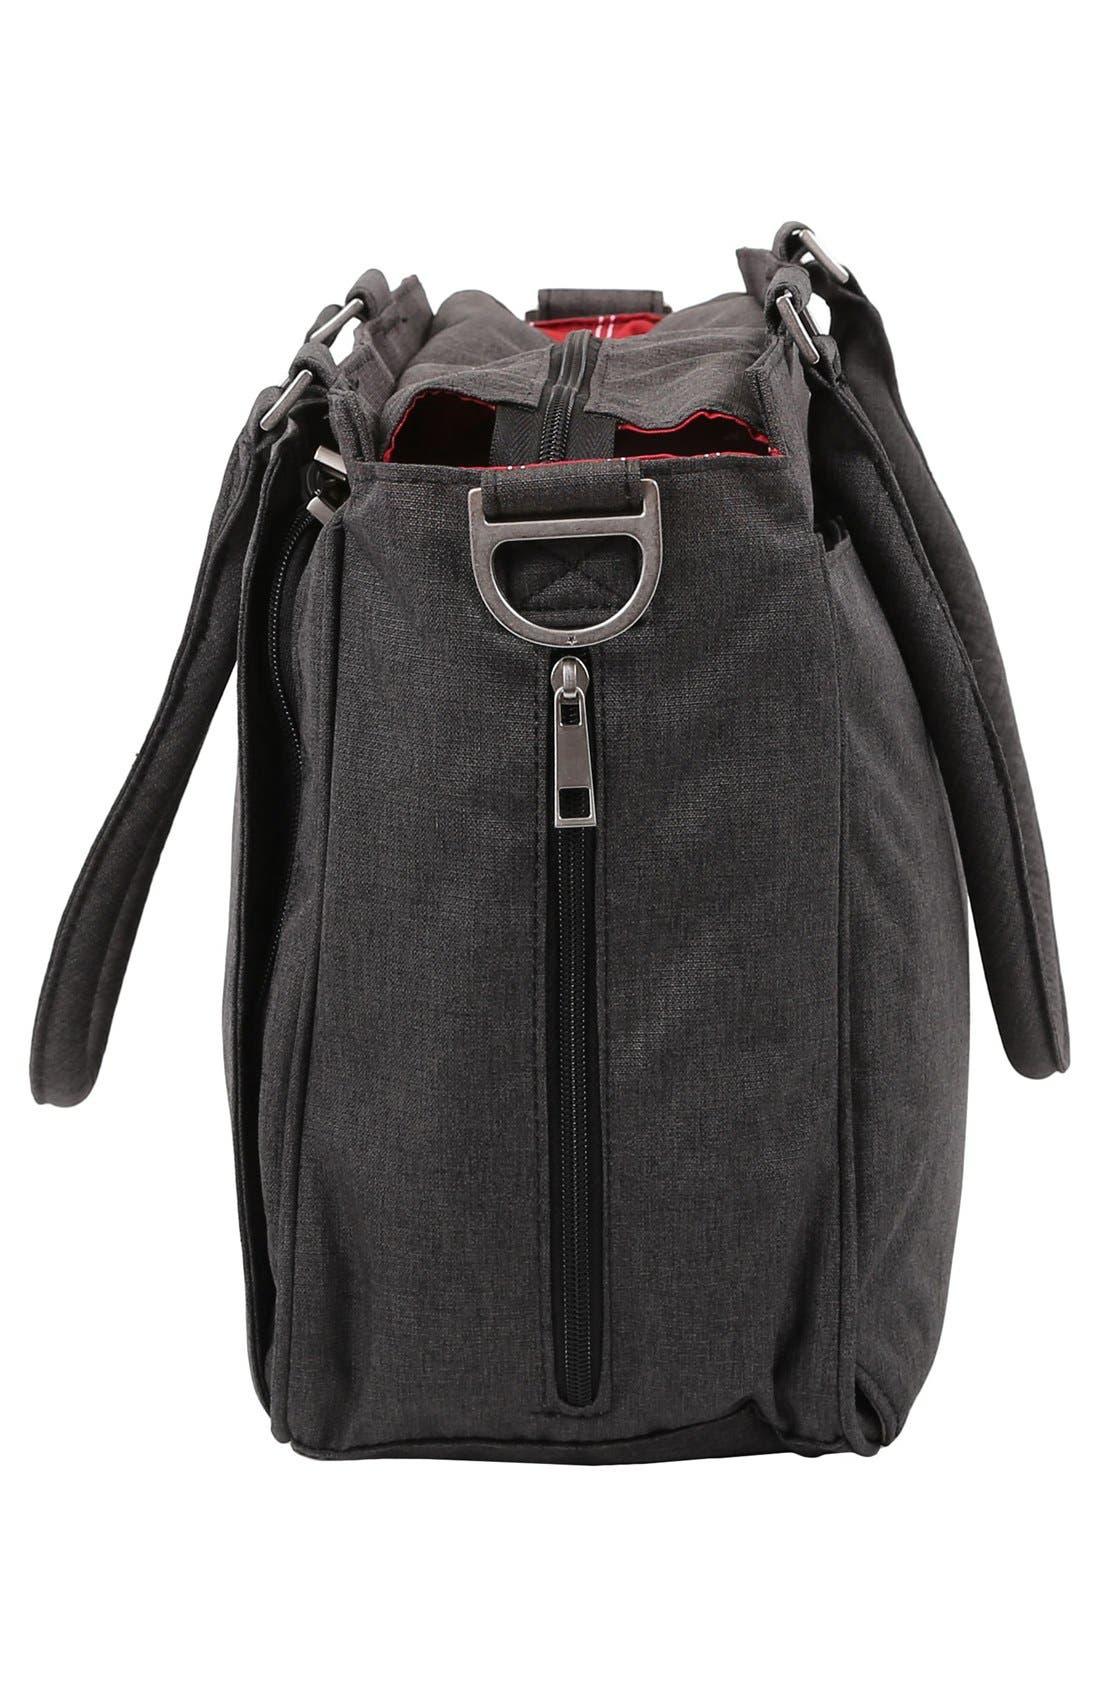 'Be Classy - Onyx Collection' Messenger Diaper Bag,                             Alternate thumbnail 2, color,                             Chrome